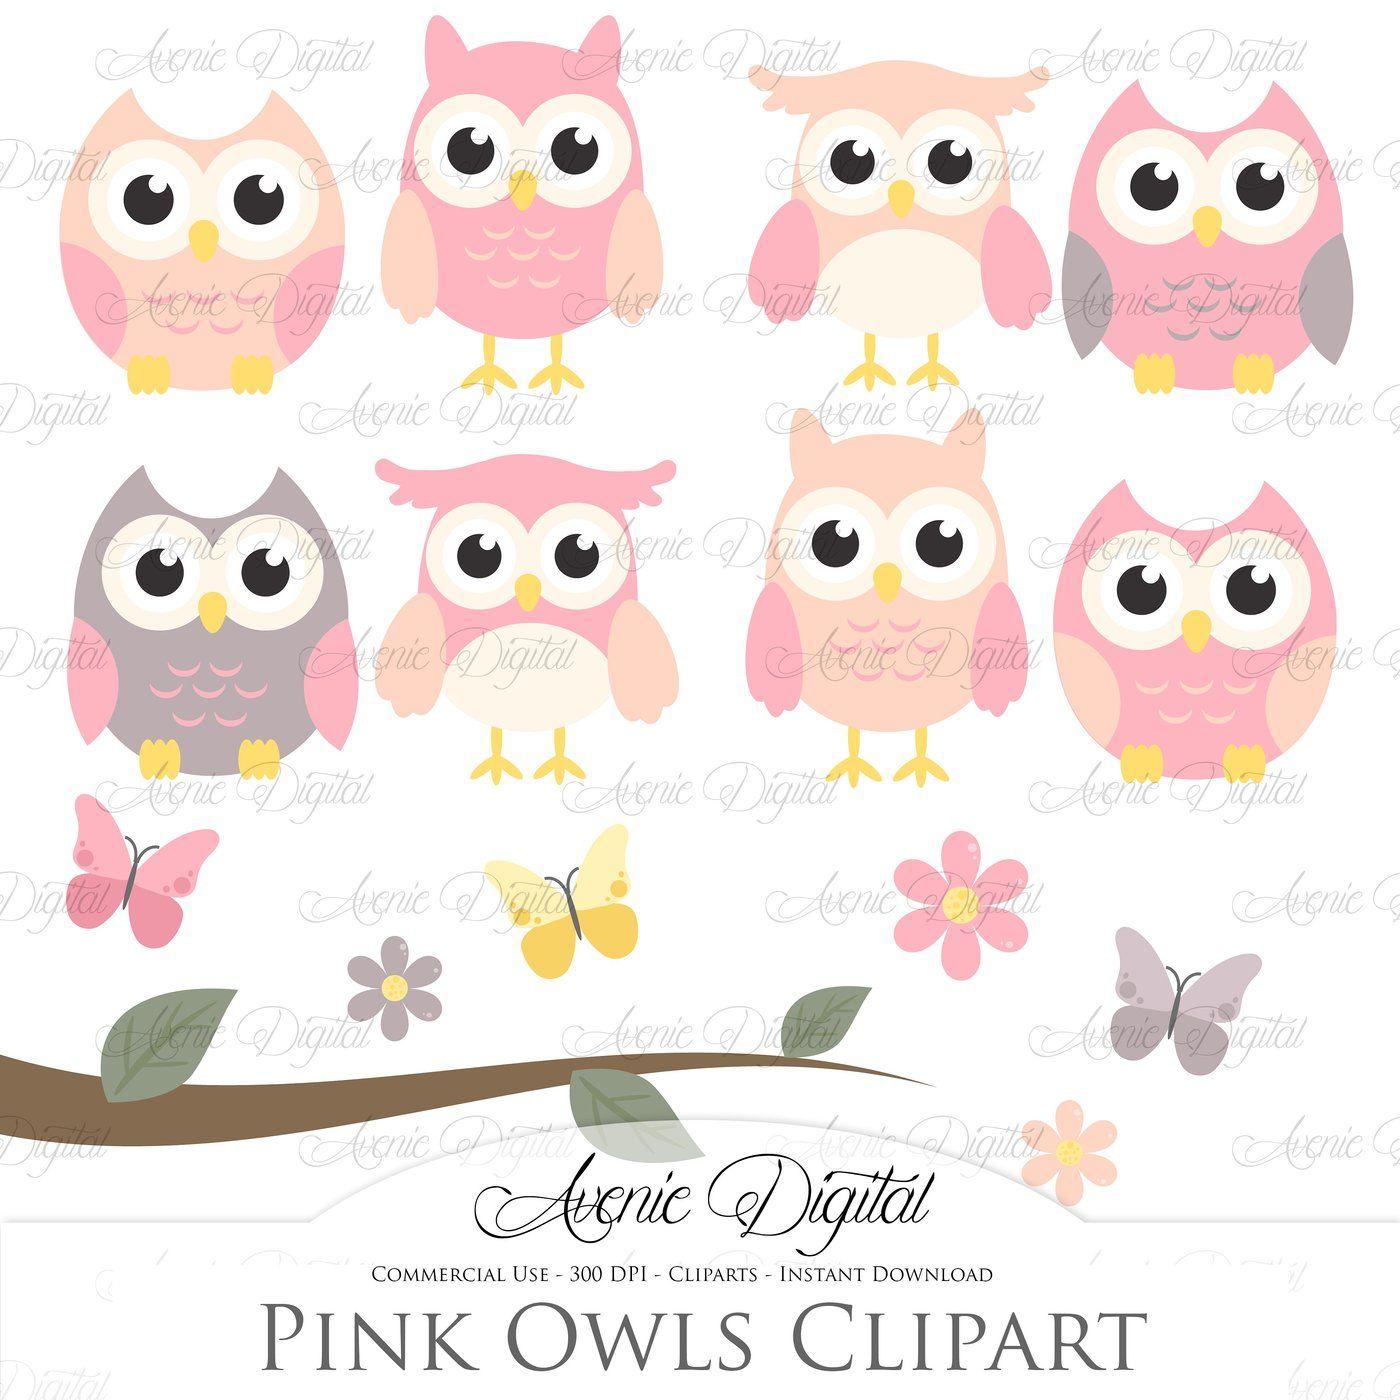 April owl clipart freeuse download The Gigantic April Craft Bundle | Cricut Machine & Silhouette Cameo ... freeuse download